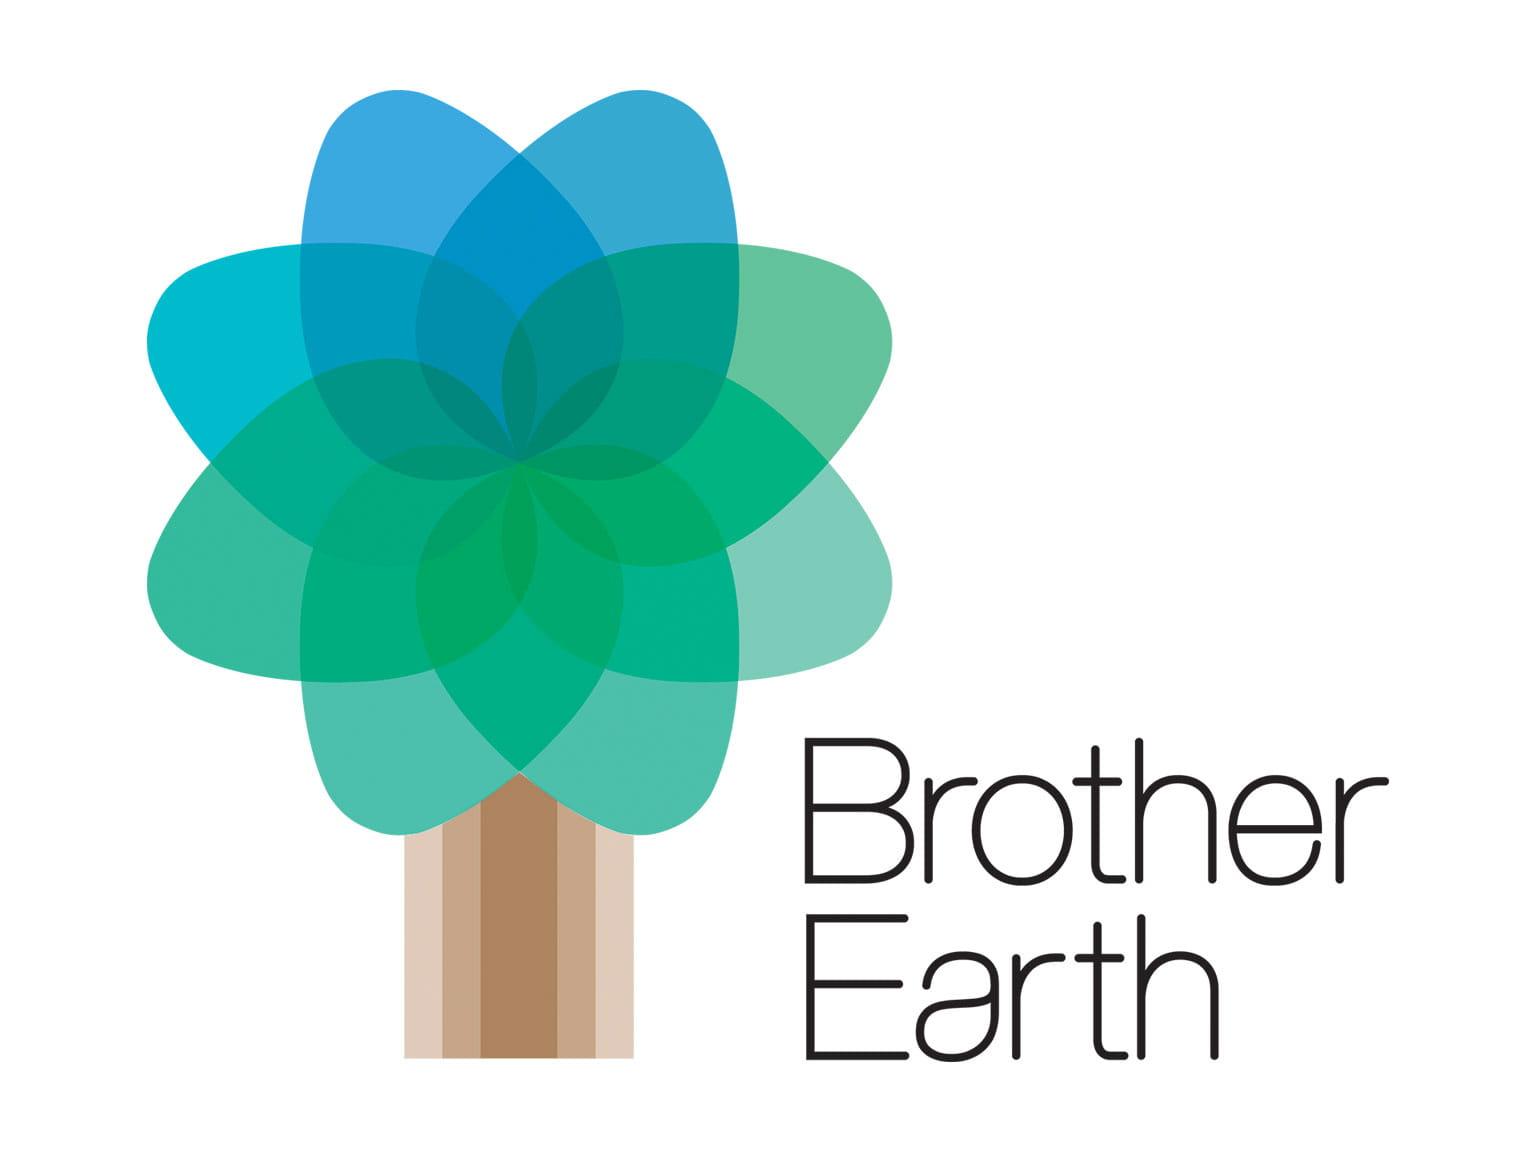 Brother Earth - Ympäristö